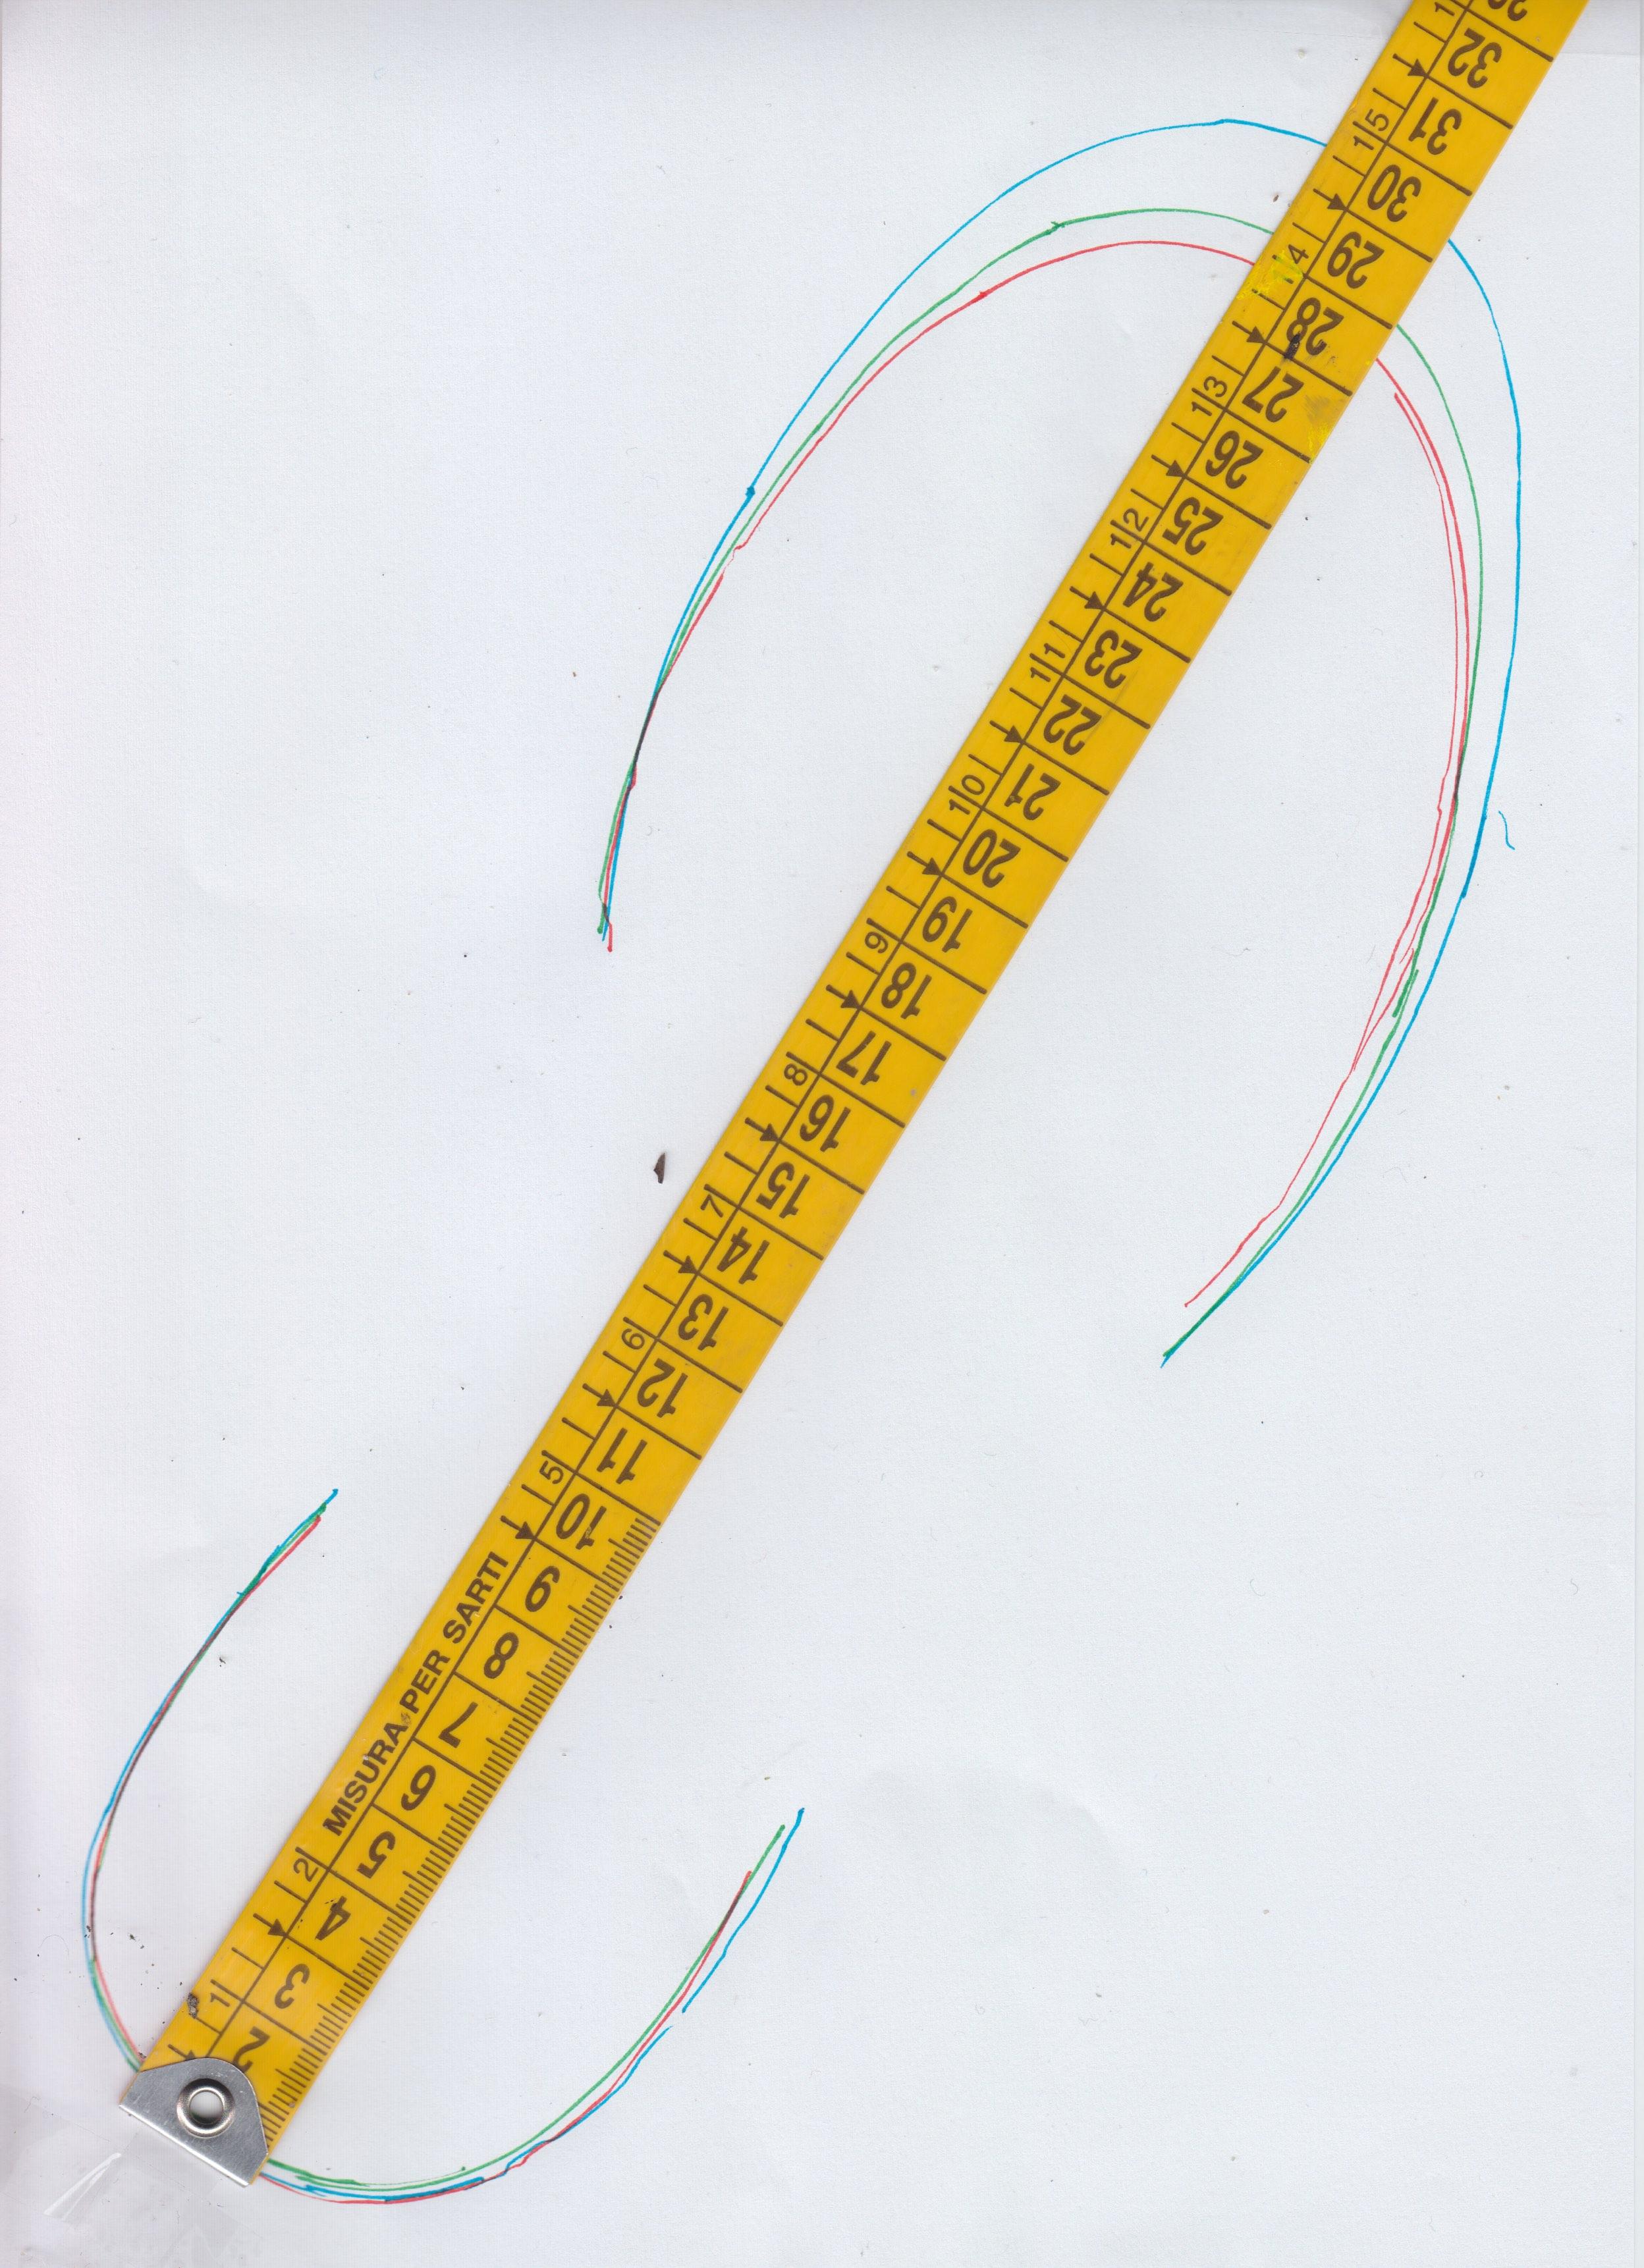 Dr martens shoe size guide 1b60 uk5 uk6 uk8 nvjuhfo Image collections